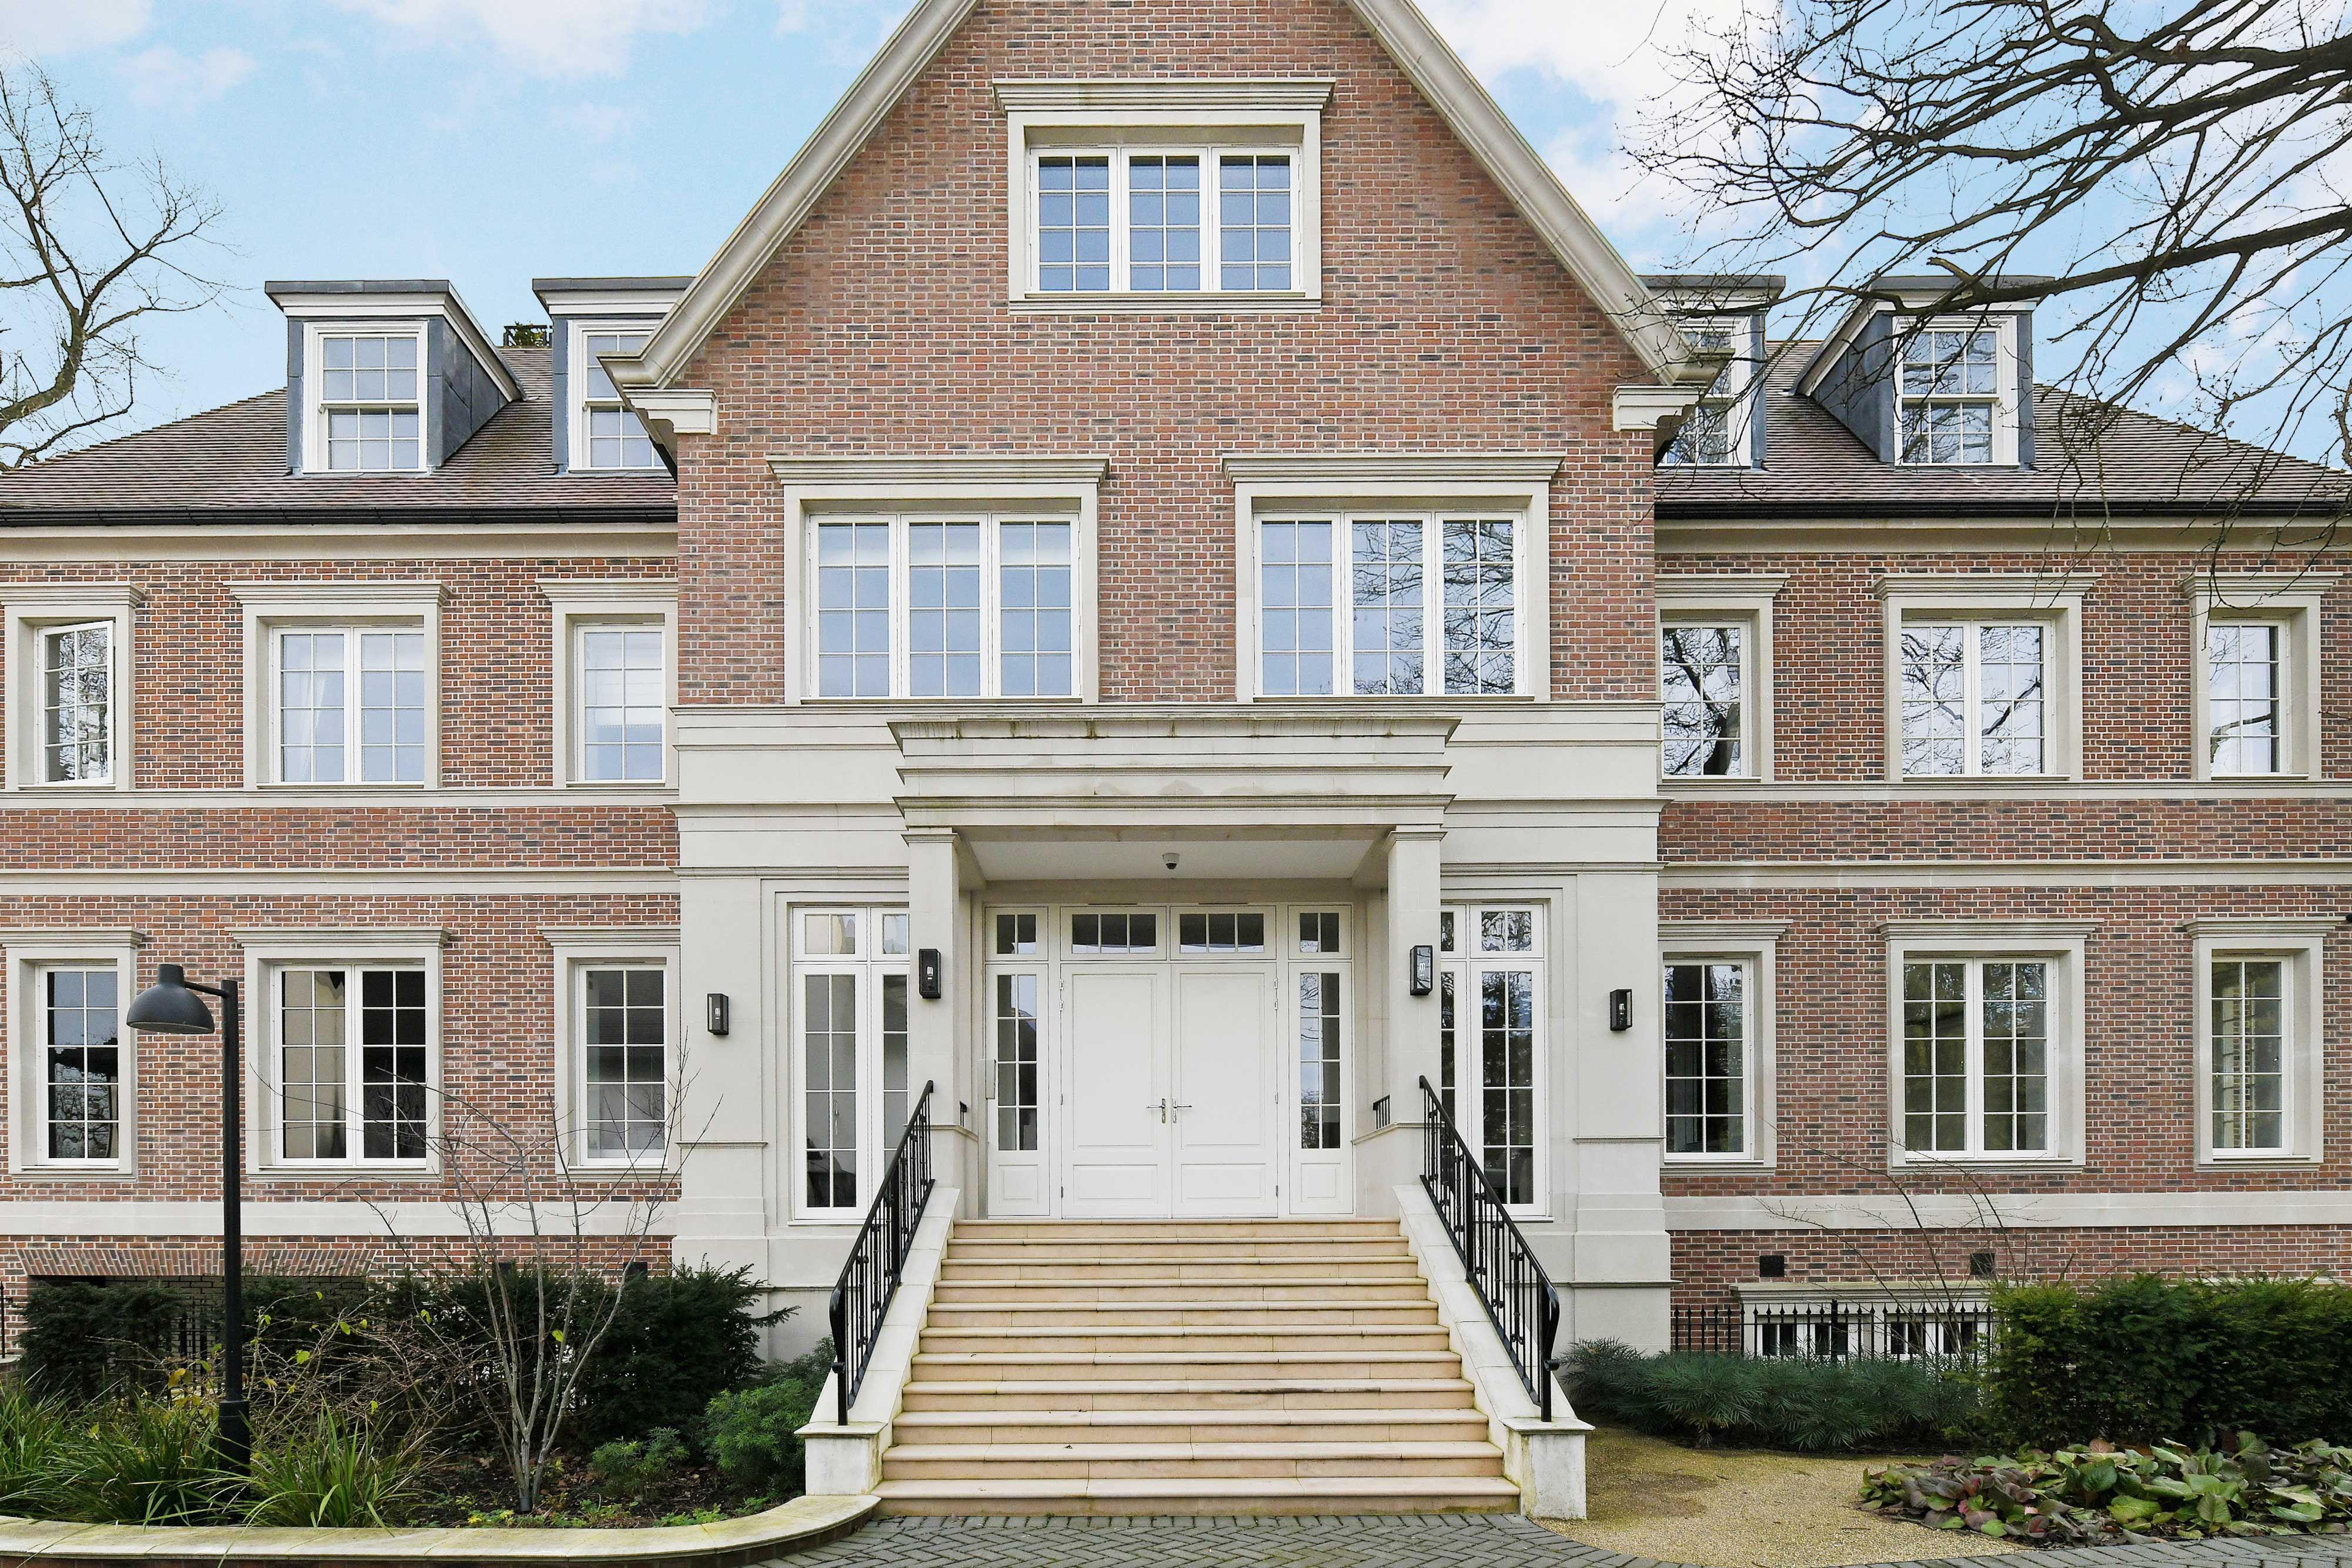 Live in a prestigious development on London's Billionaires' Row